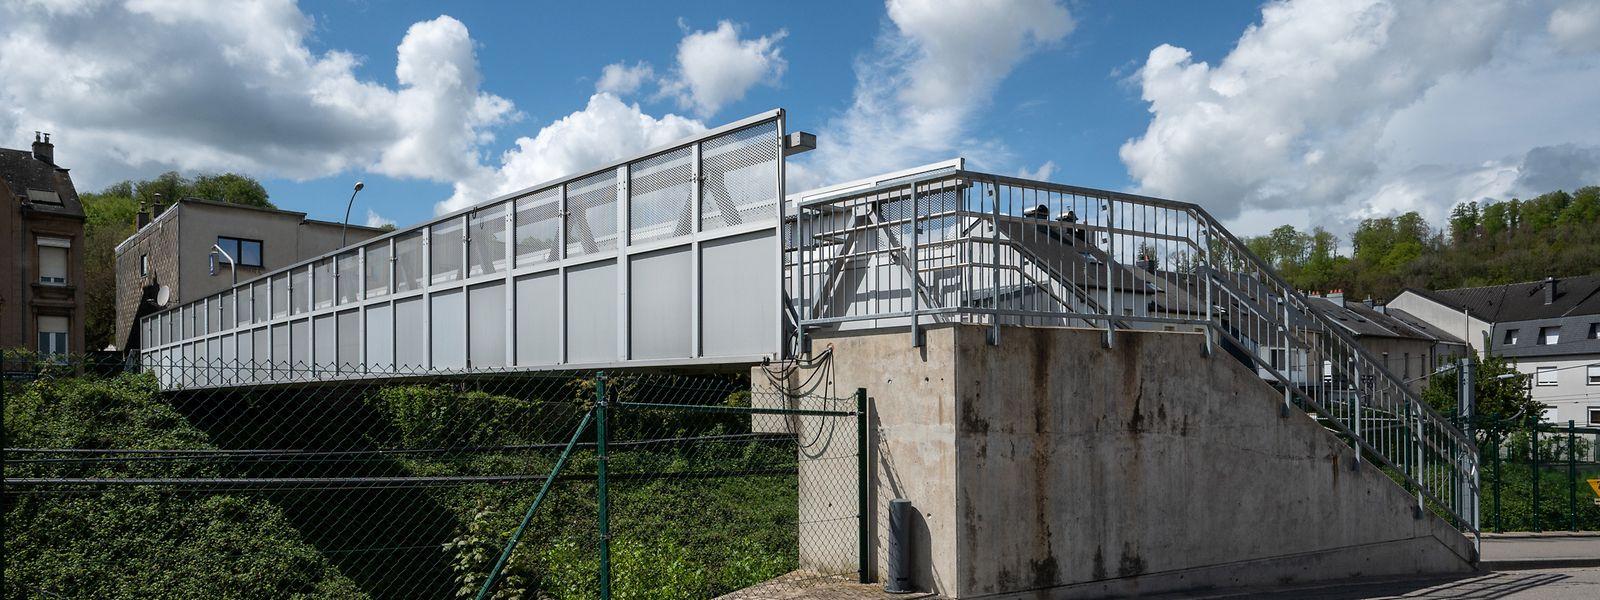 Lok , Beles , Probleme für Personnen mit Mobilite Reduite bei Bahnüberquerung Beles/Friedhof , Foto:Guy Jallay/Luxemburger Wort